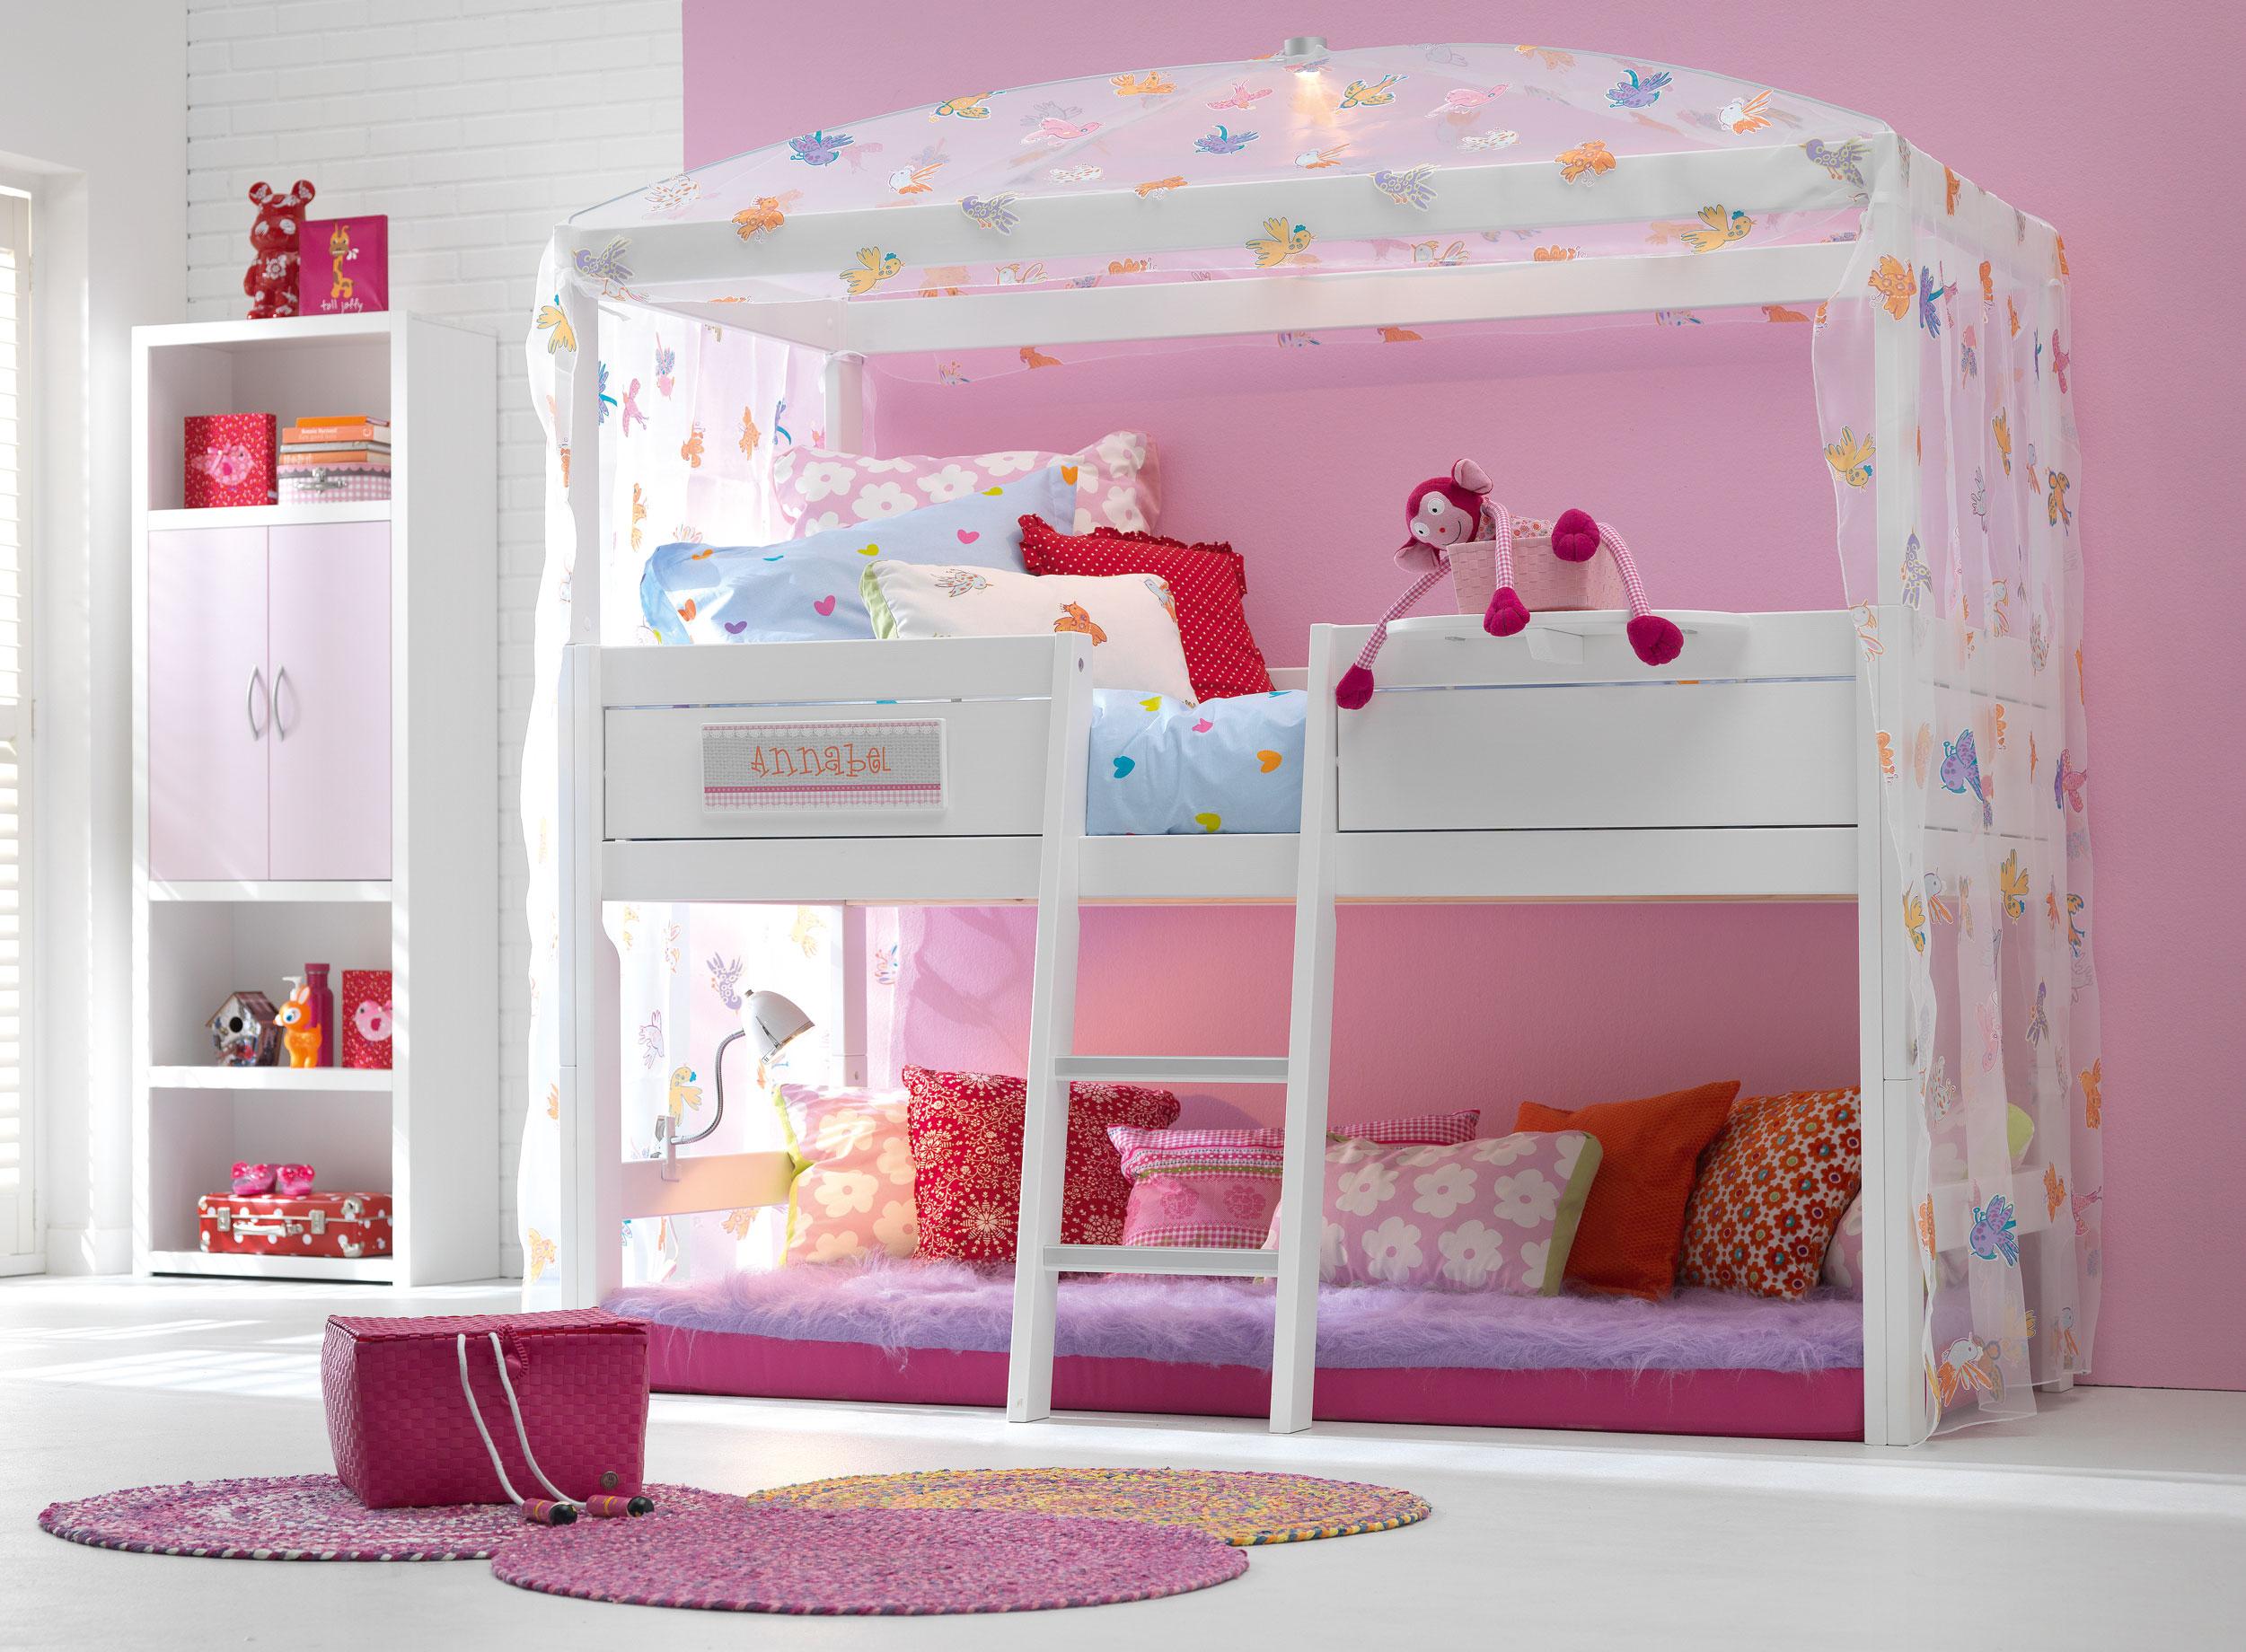 Muebles Infantiles Modernos Nidi Muebles Infantiles Con Elegancia  # Muebles Laqueados Infantiles